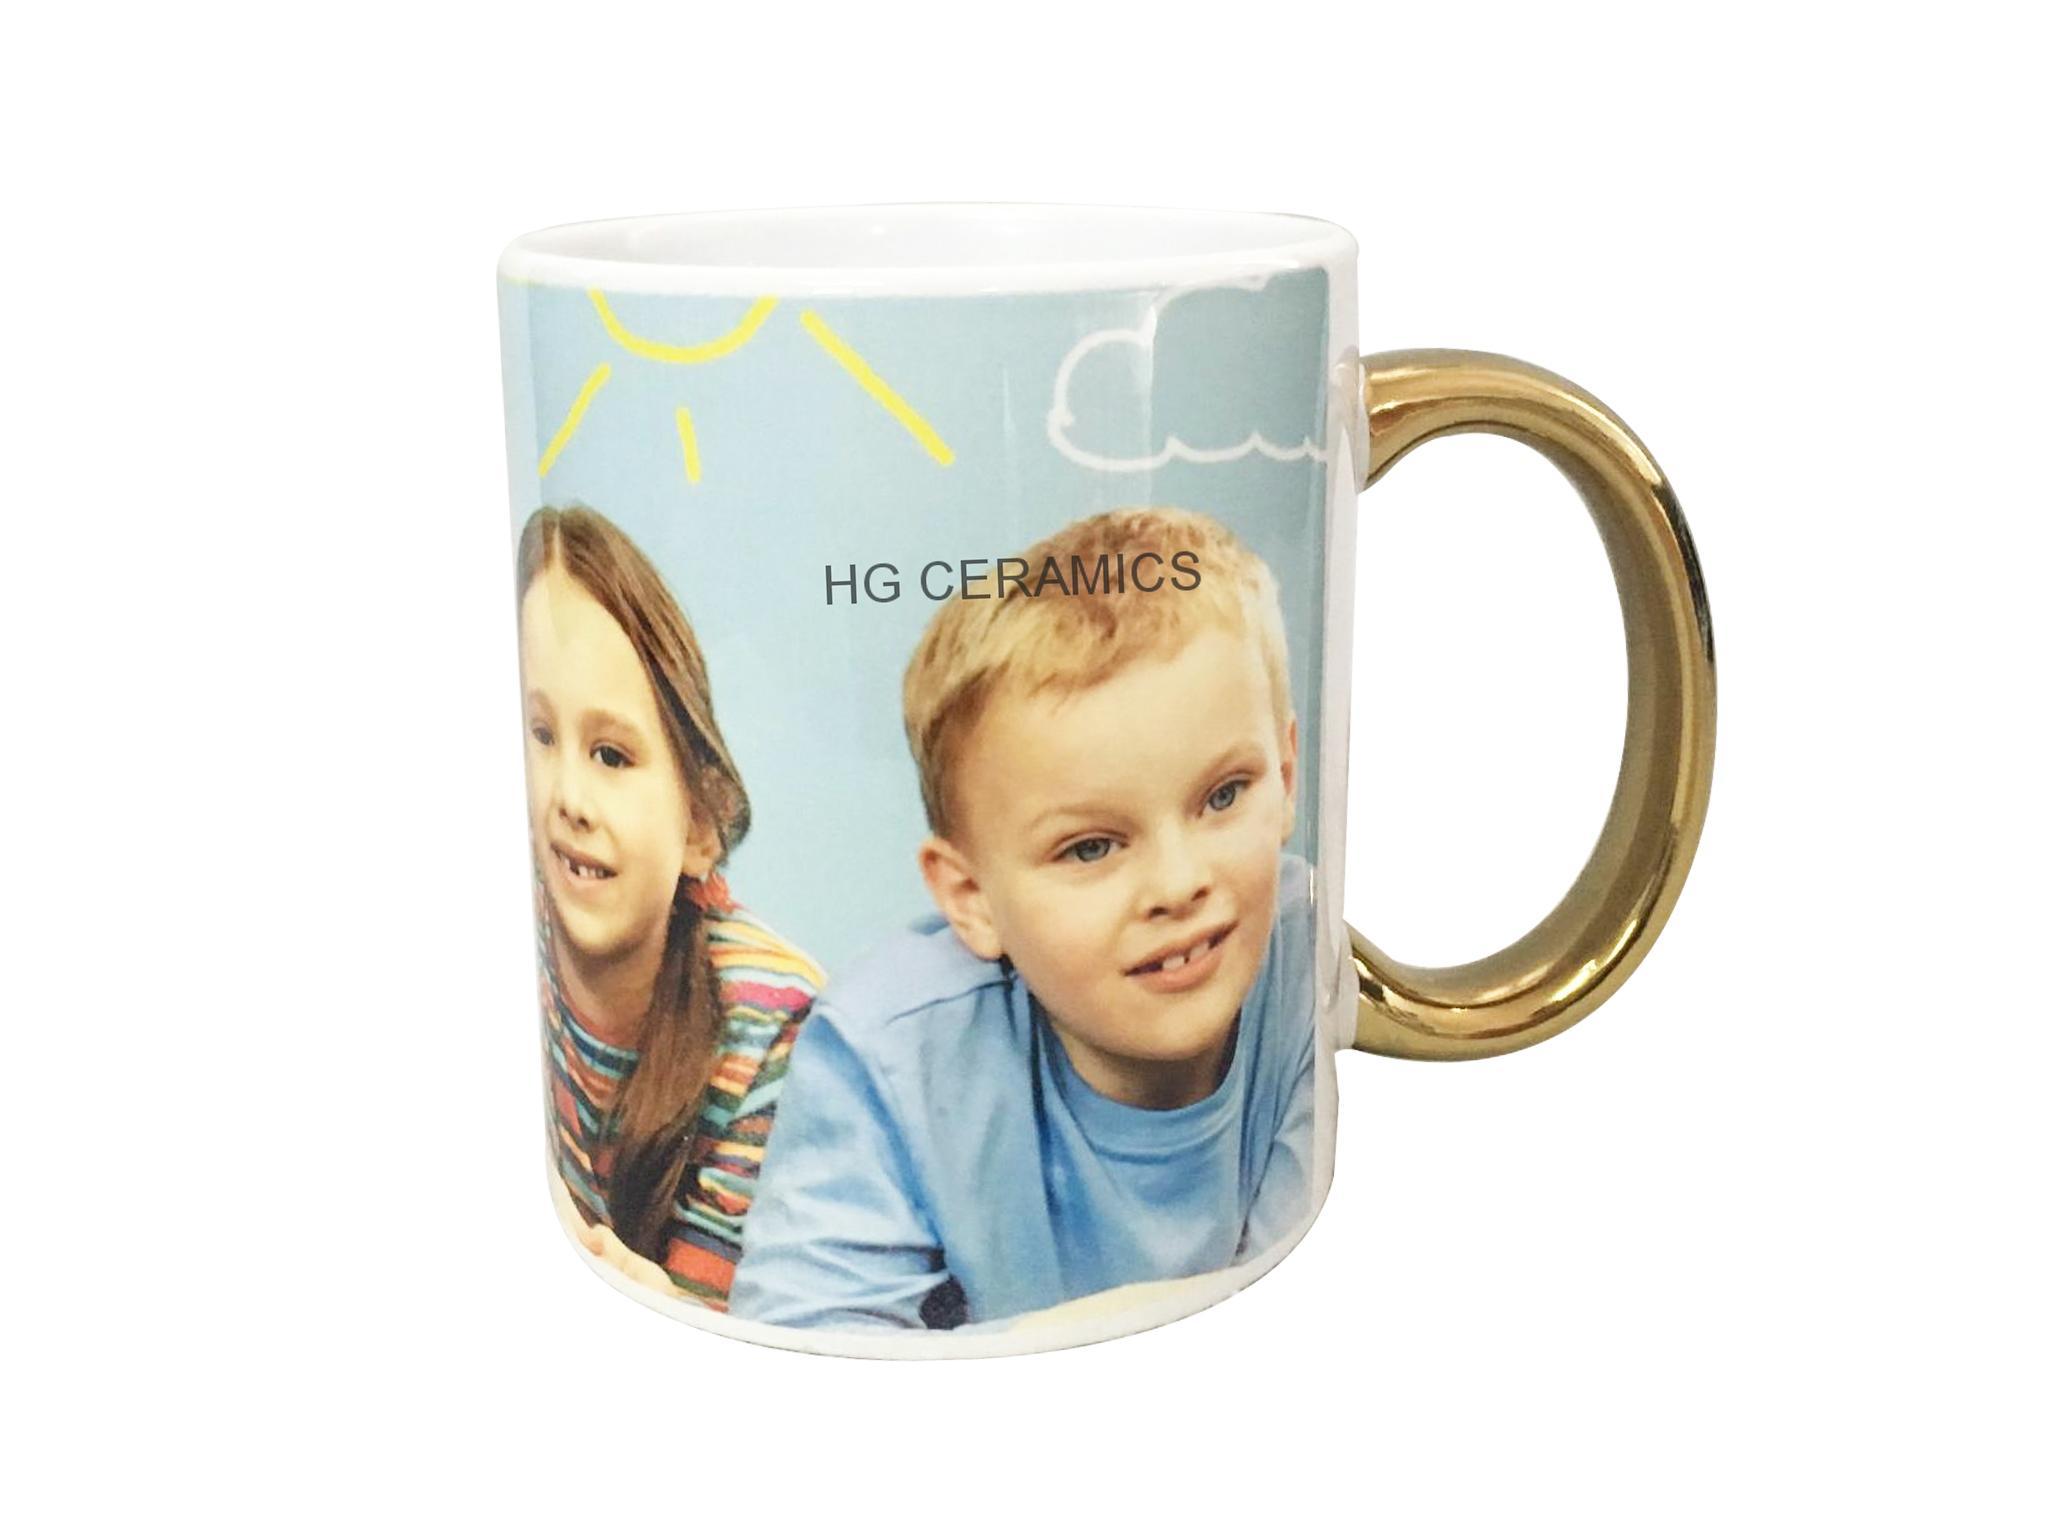 11oz Sublimation white mug with gold /si  er handle  2